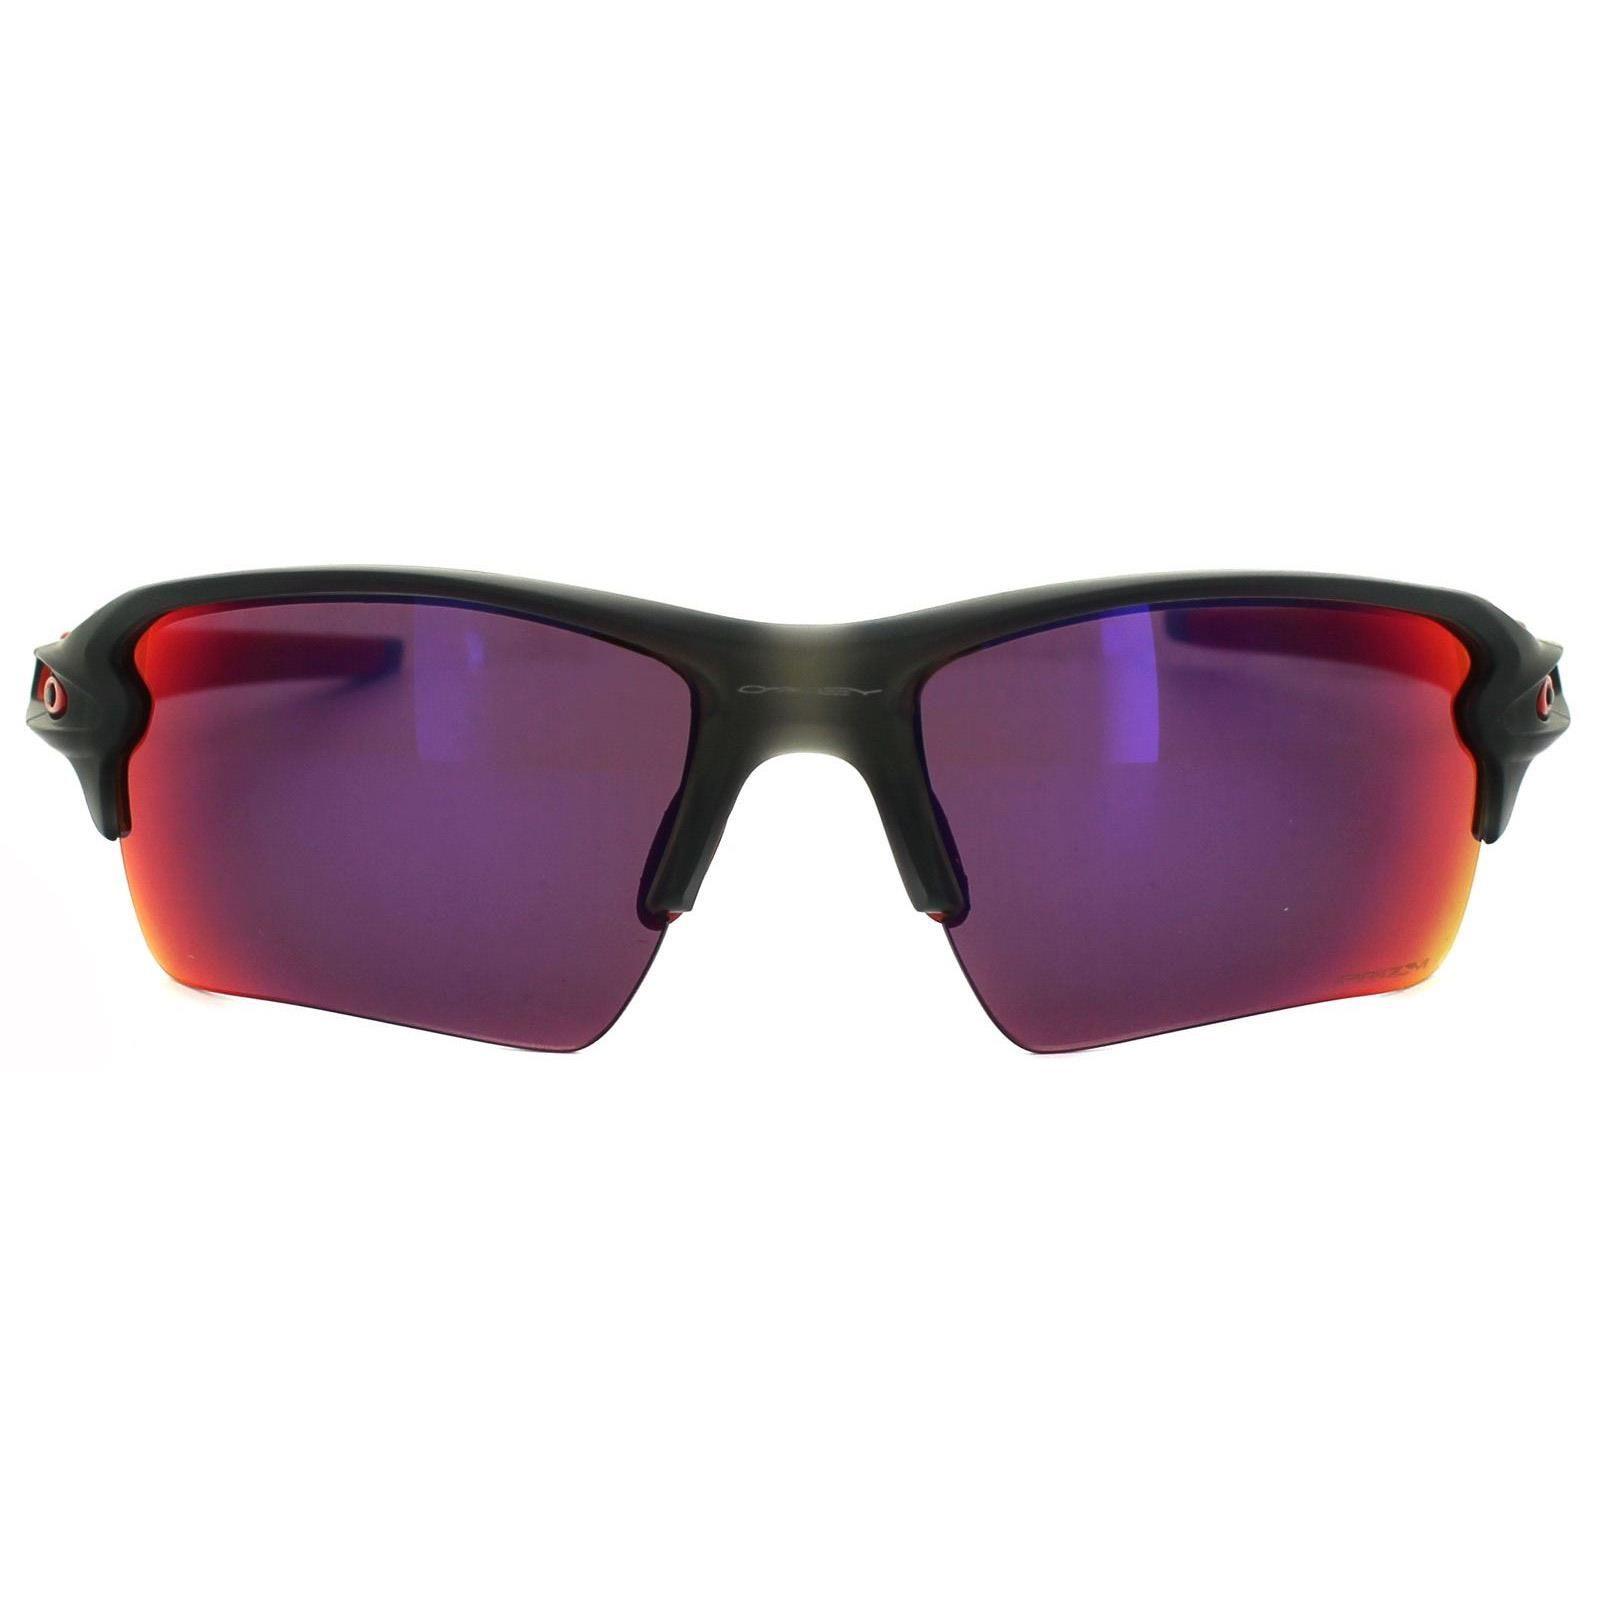 Oakley Sunglasses Flak 2.0 XL OO9188-04 Matt Grey Smoke Prizm Road